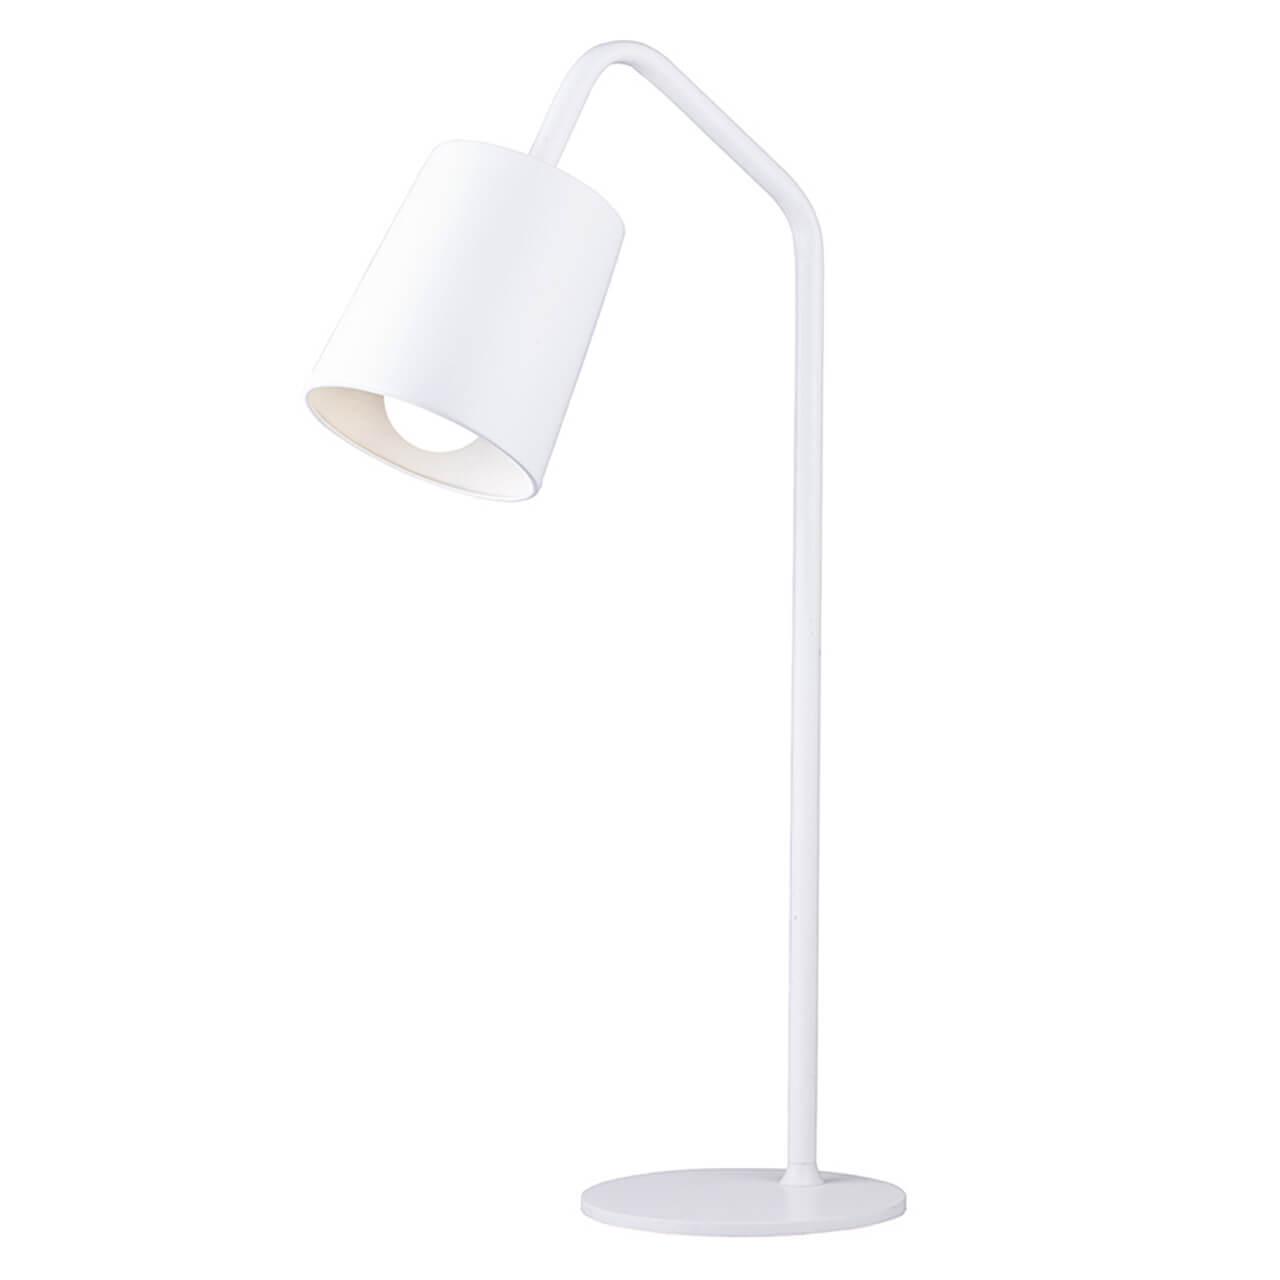 Фото - Настольная лампа Arti Lampadari Ultimo E 4.1.1 W Ultimo mossanen dora levy el ultimo romanov